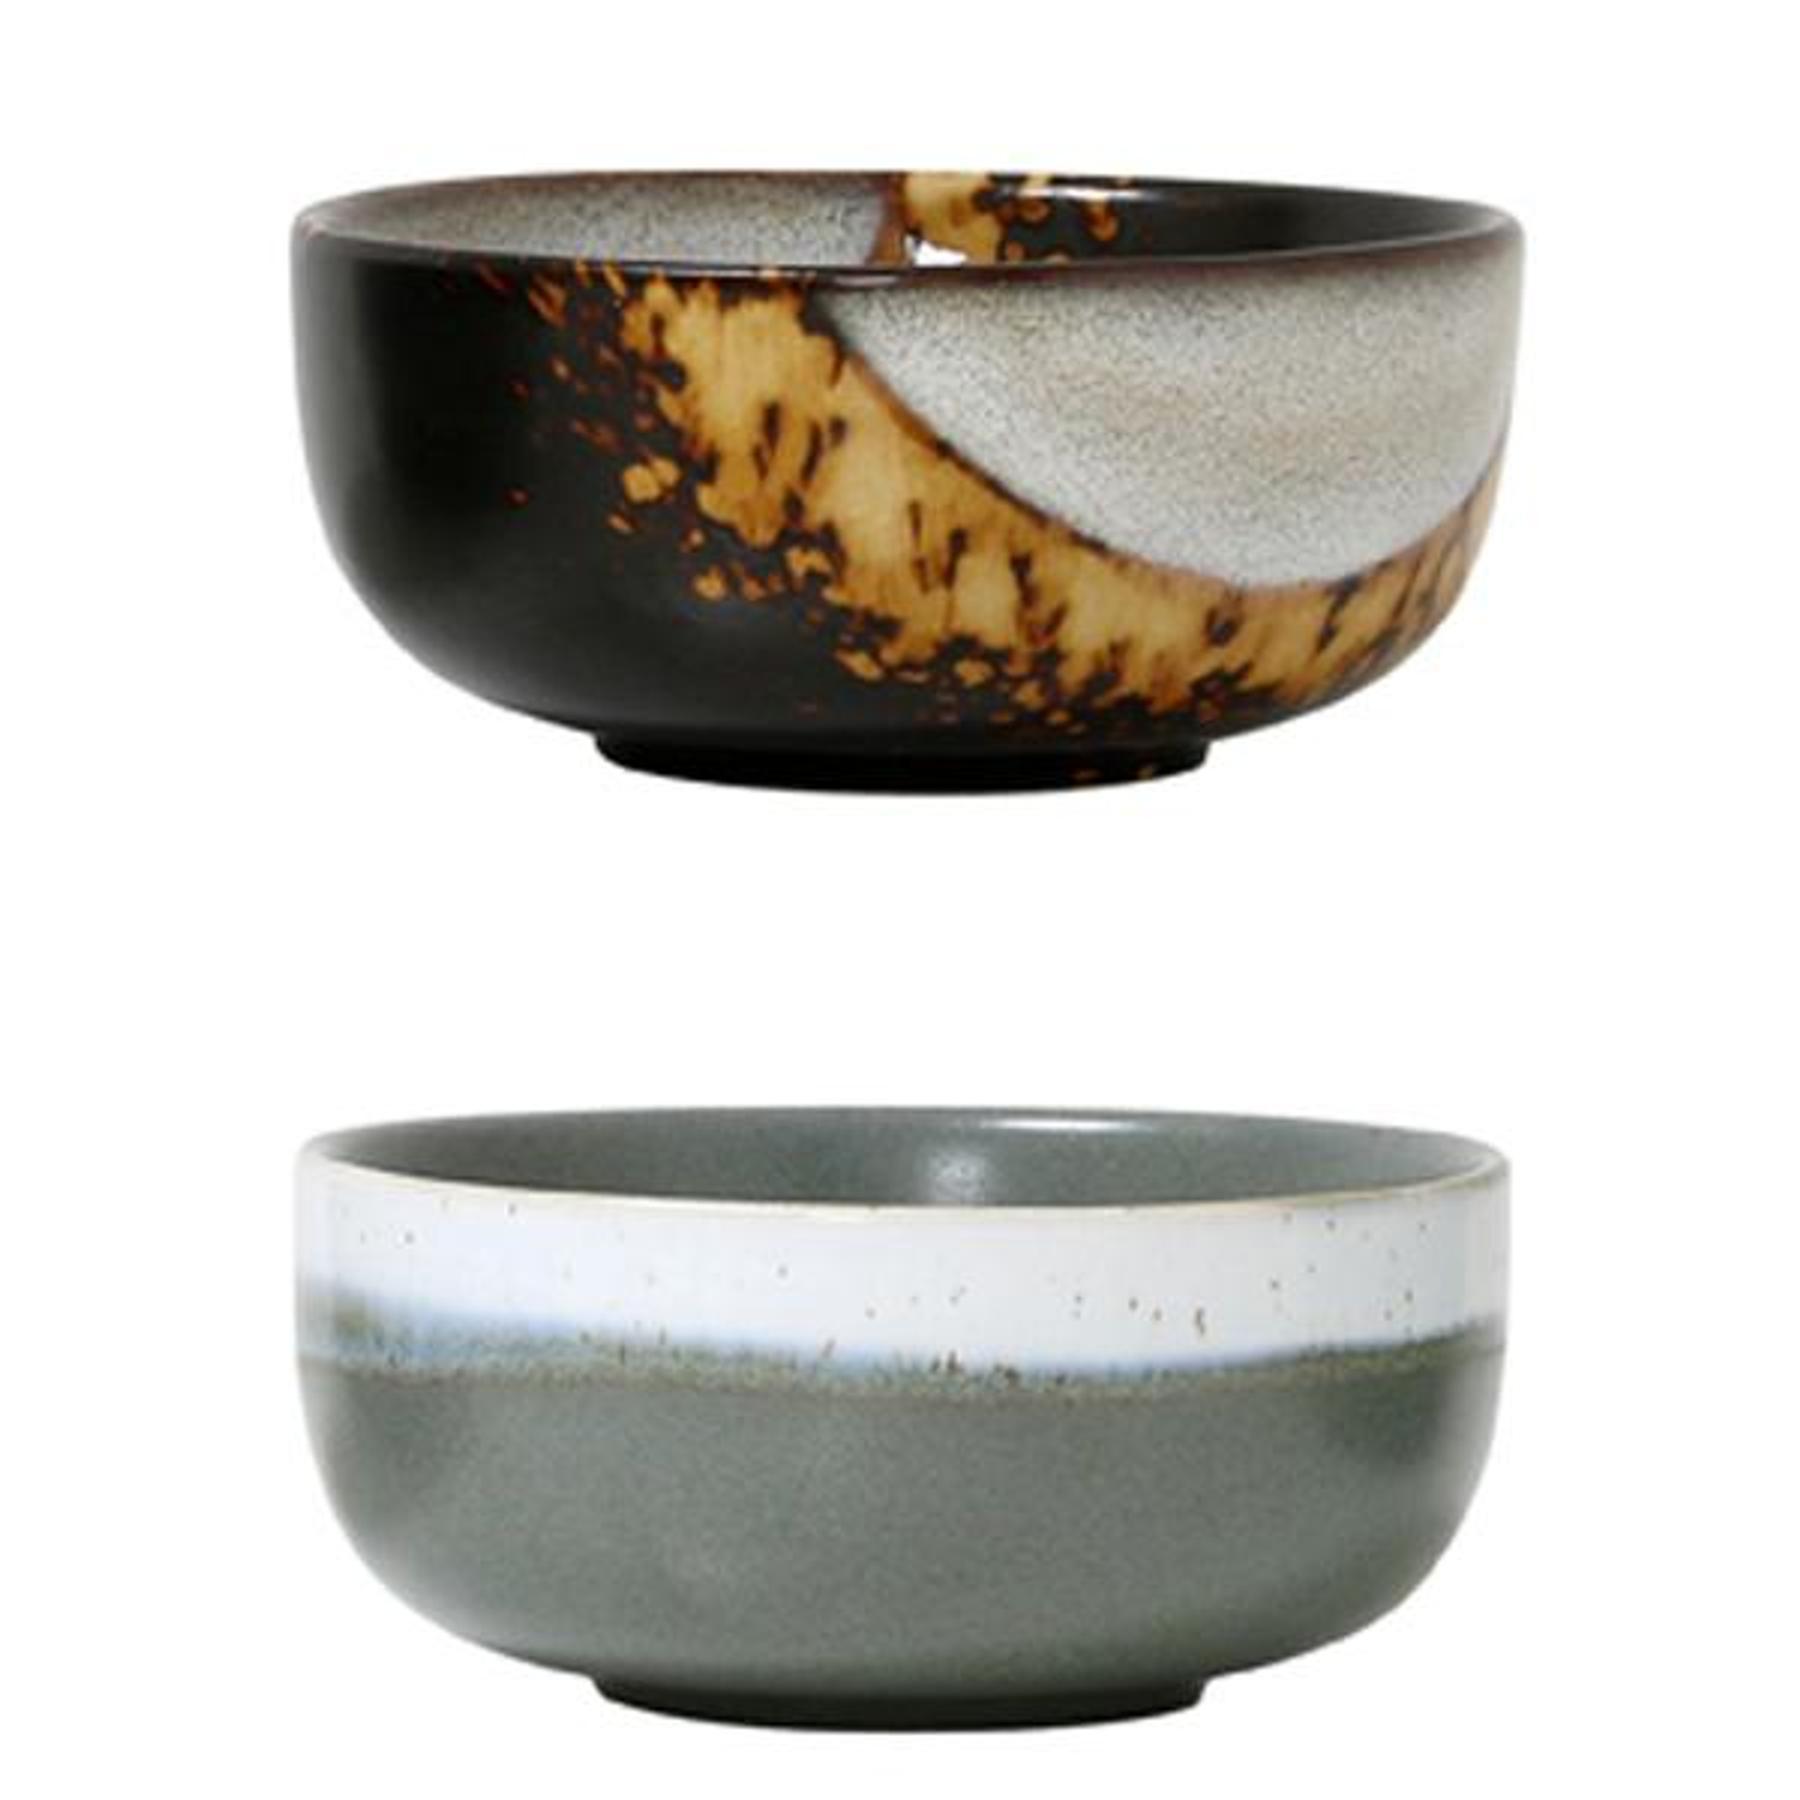 Vintage keramik sch lchen flame 70er jahre retro for Lampen 70er style